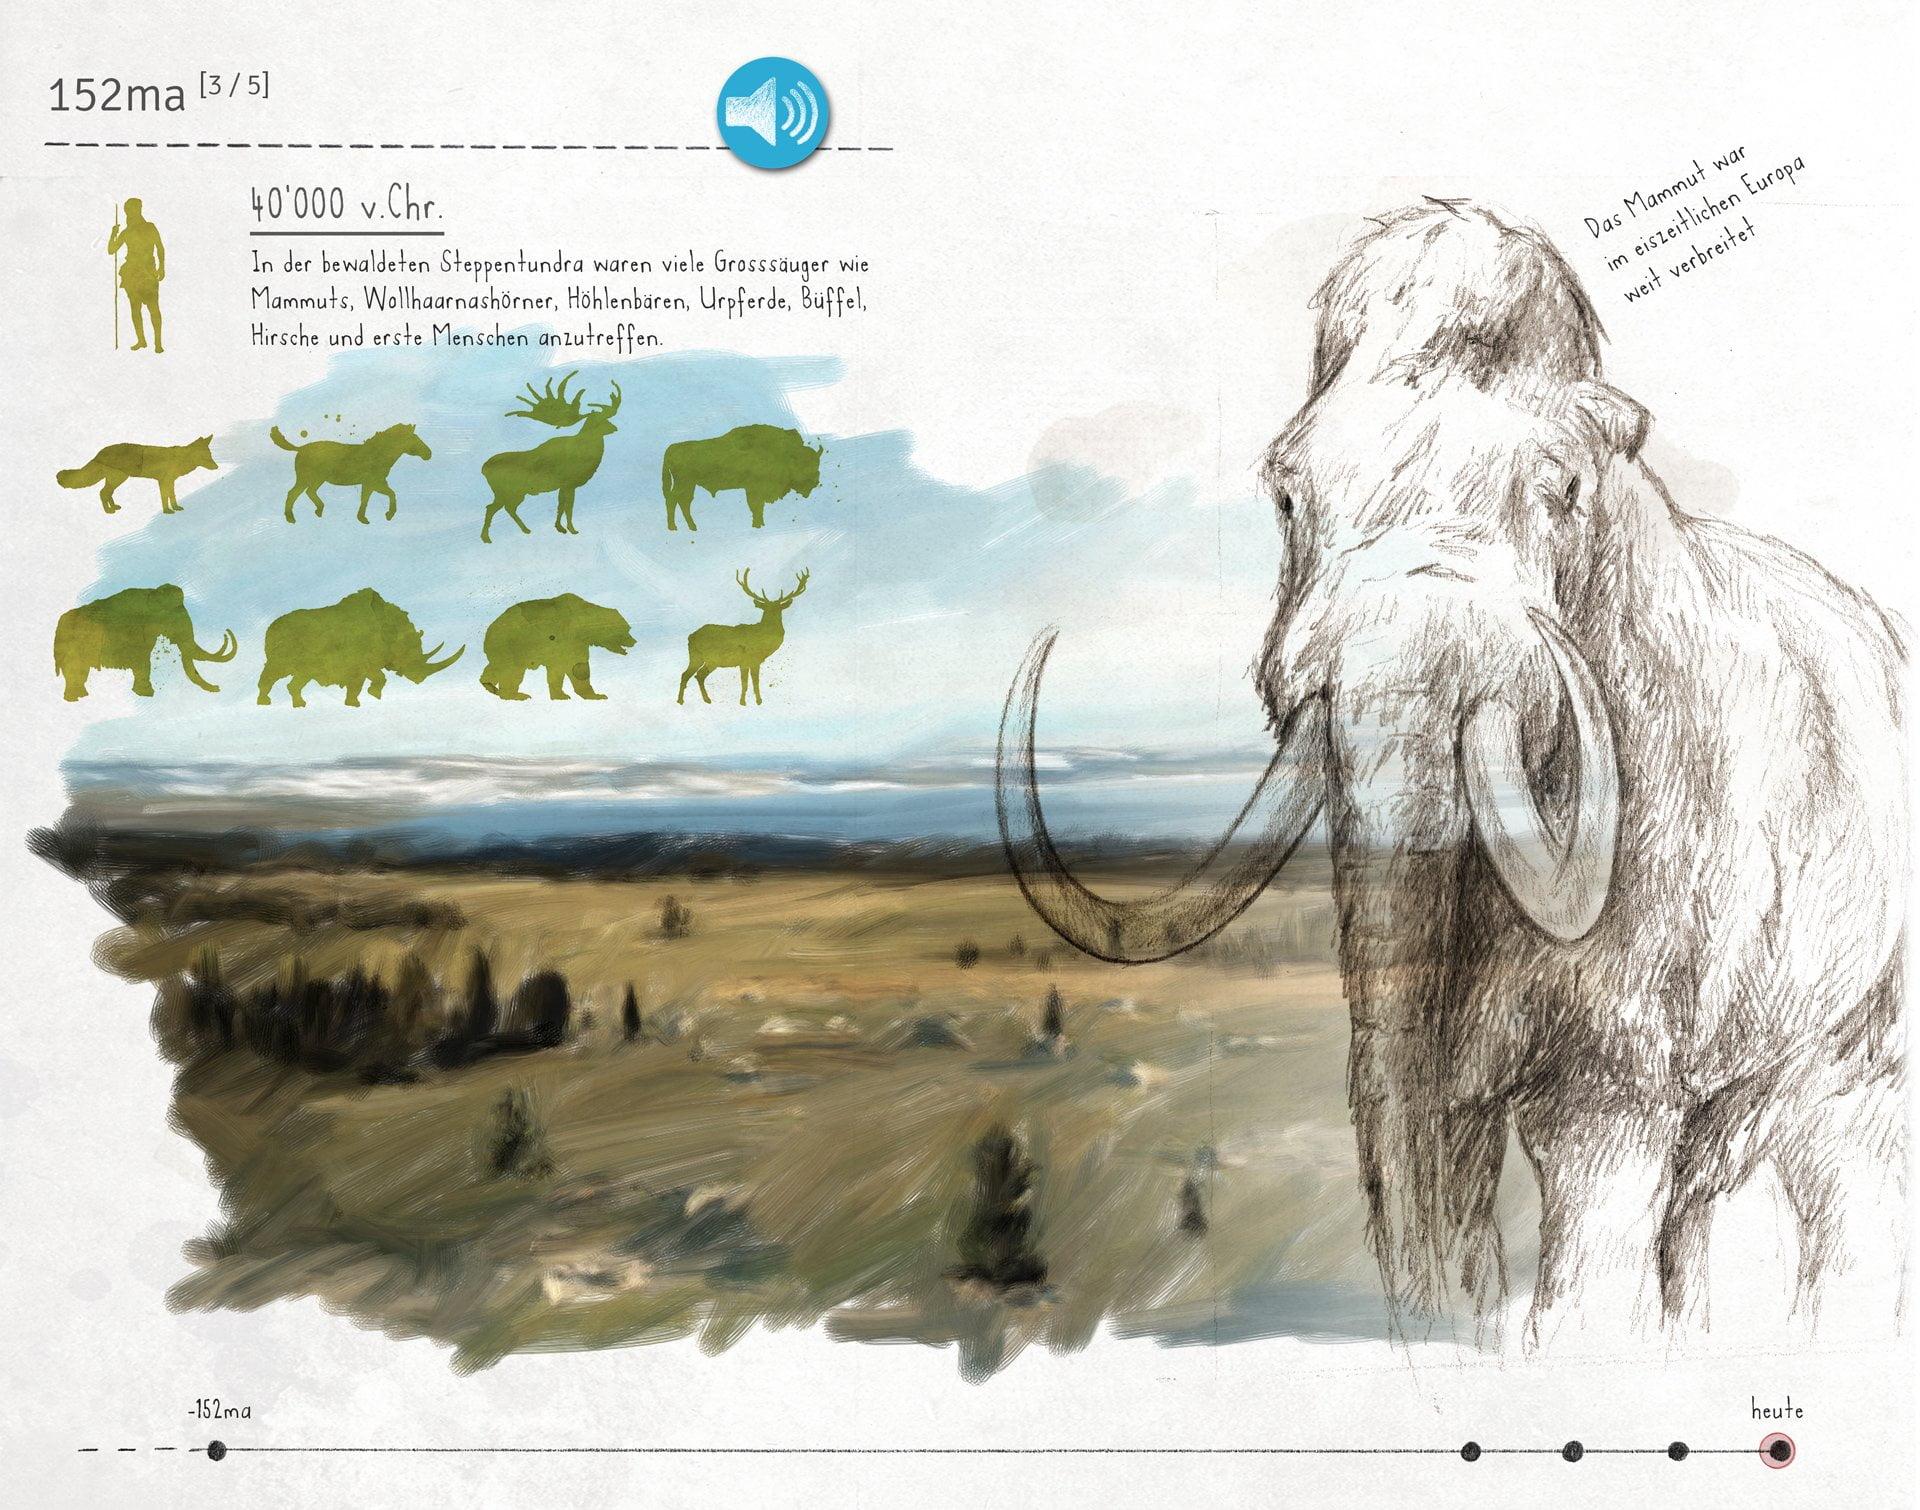 Paléoskop, digitales Skizzenbuch, Eiszeit, ikonaut